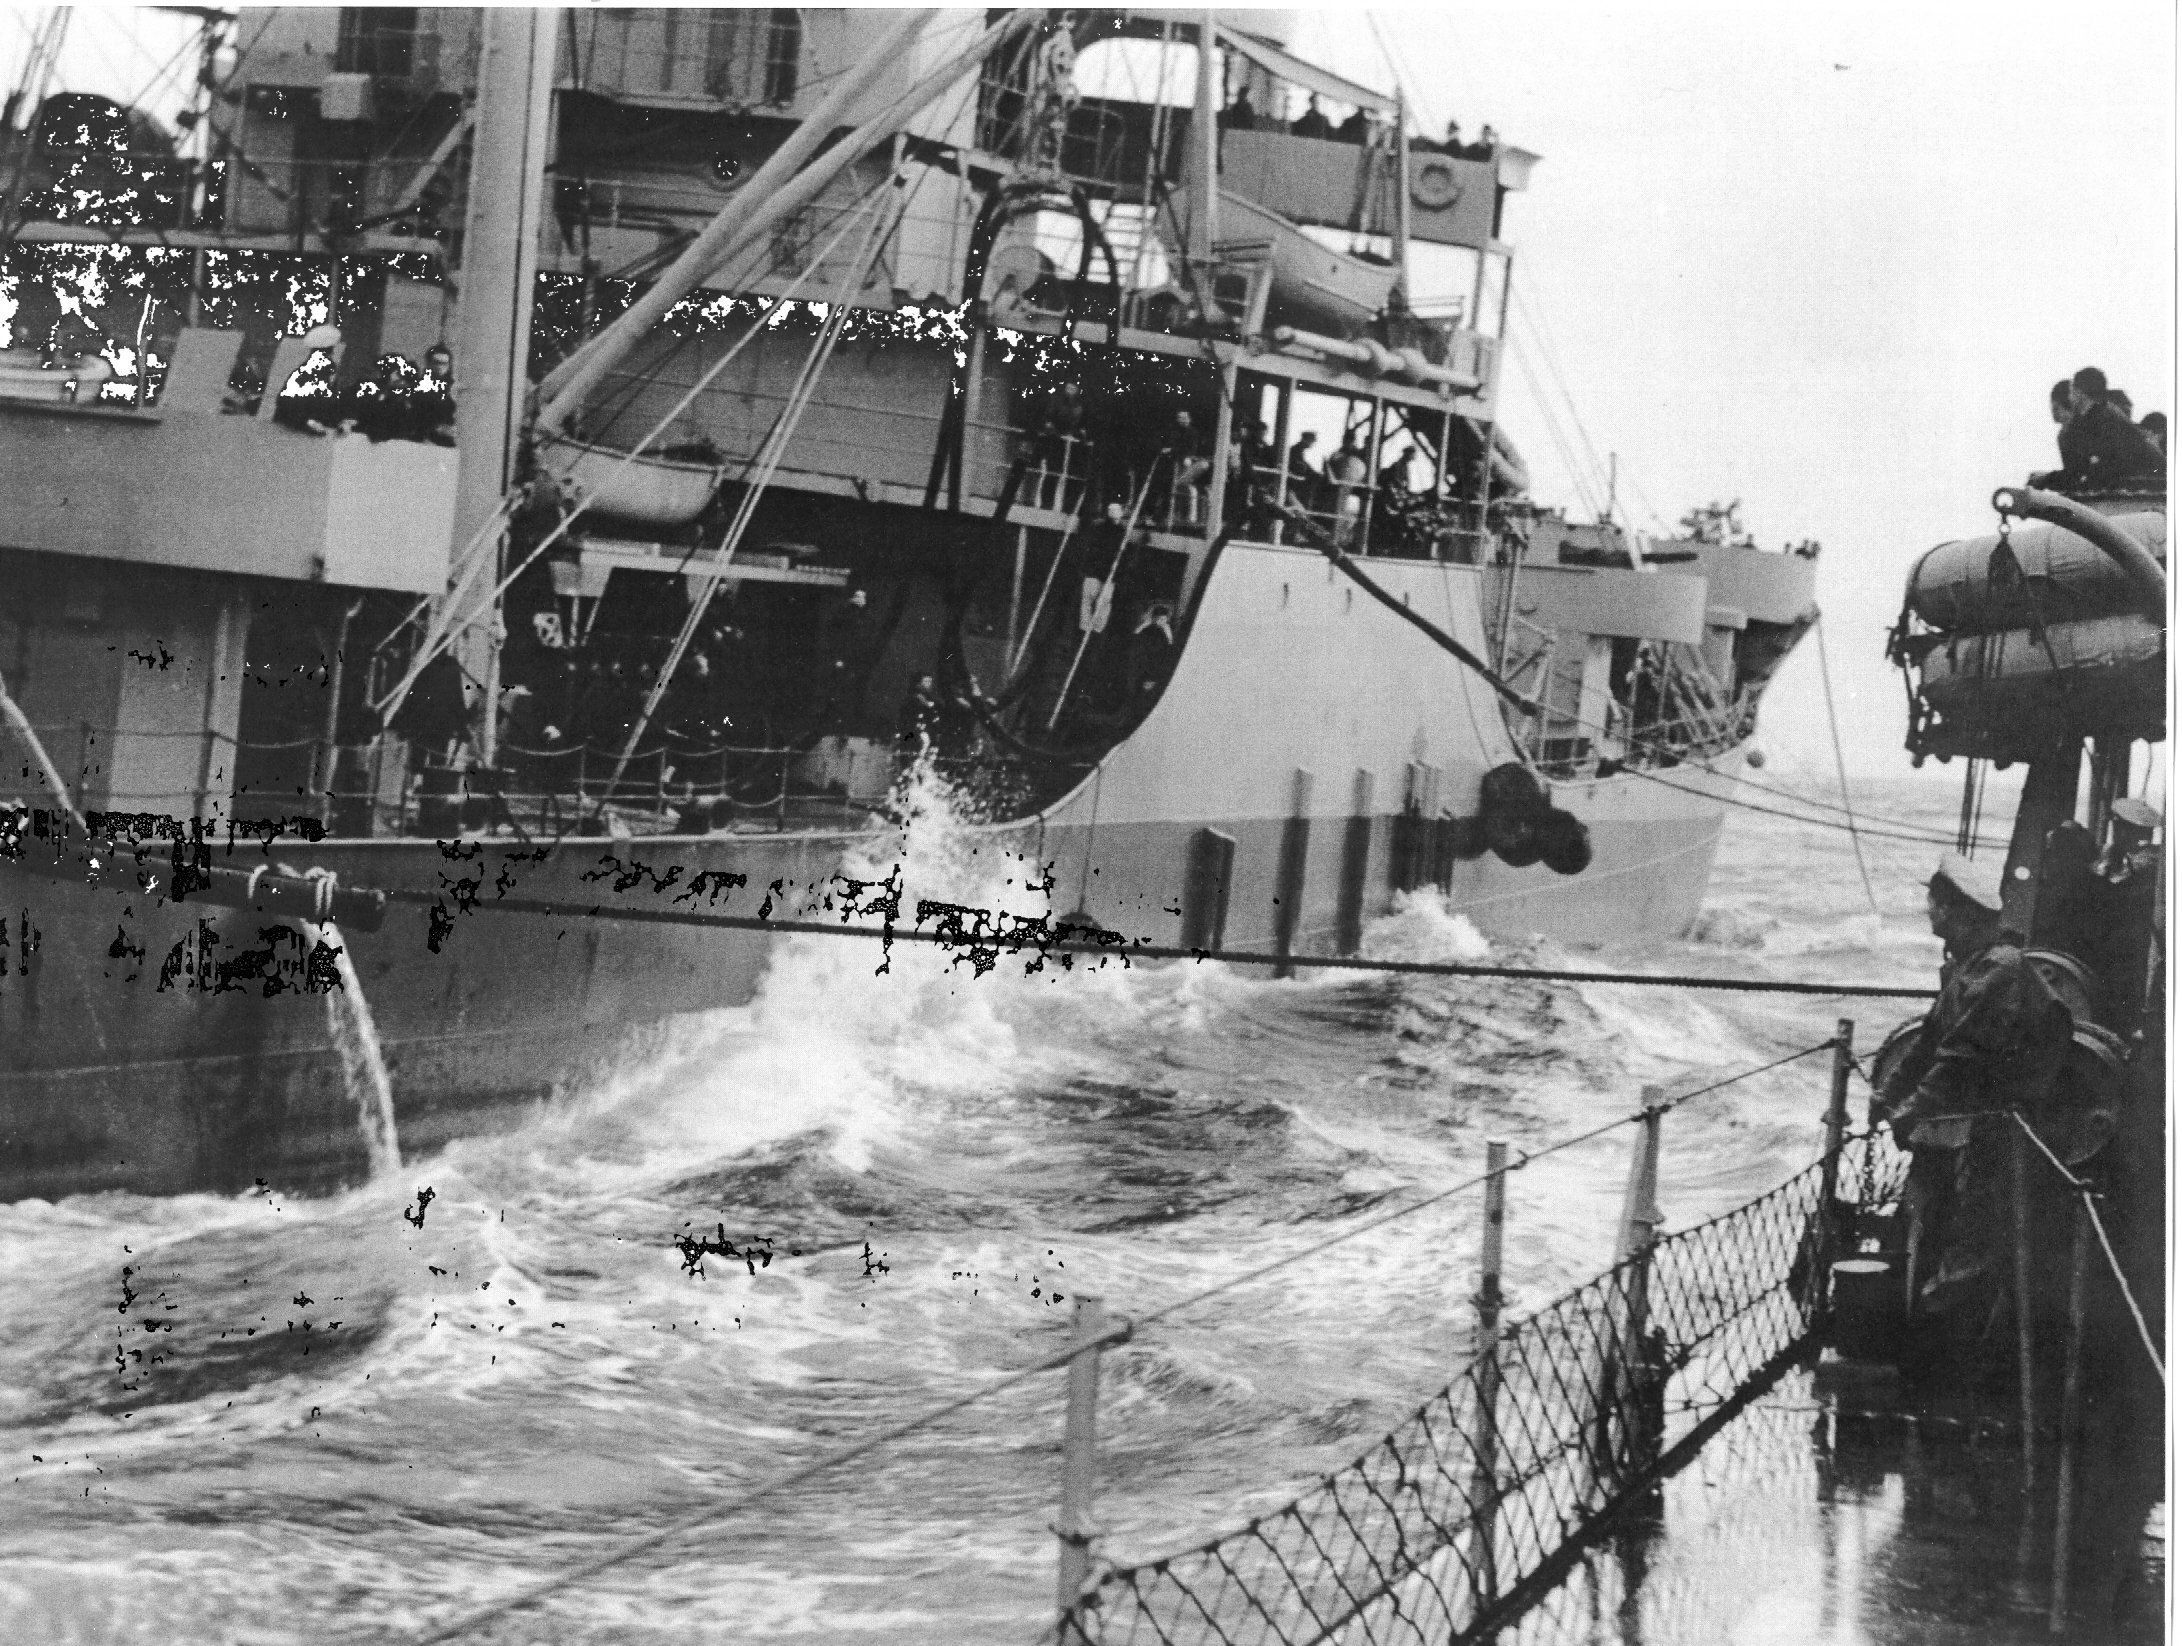 USS Housatonic (AO 35) refueling USS Wilkes (DD 441)